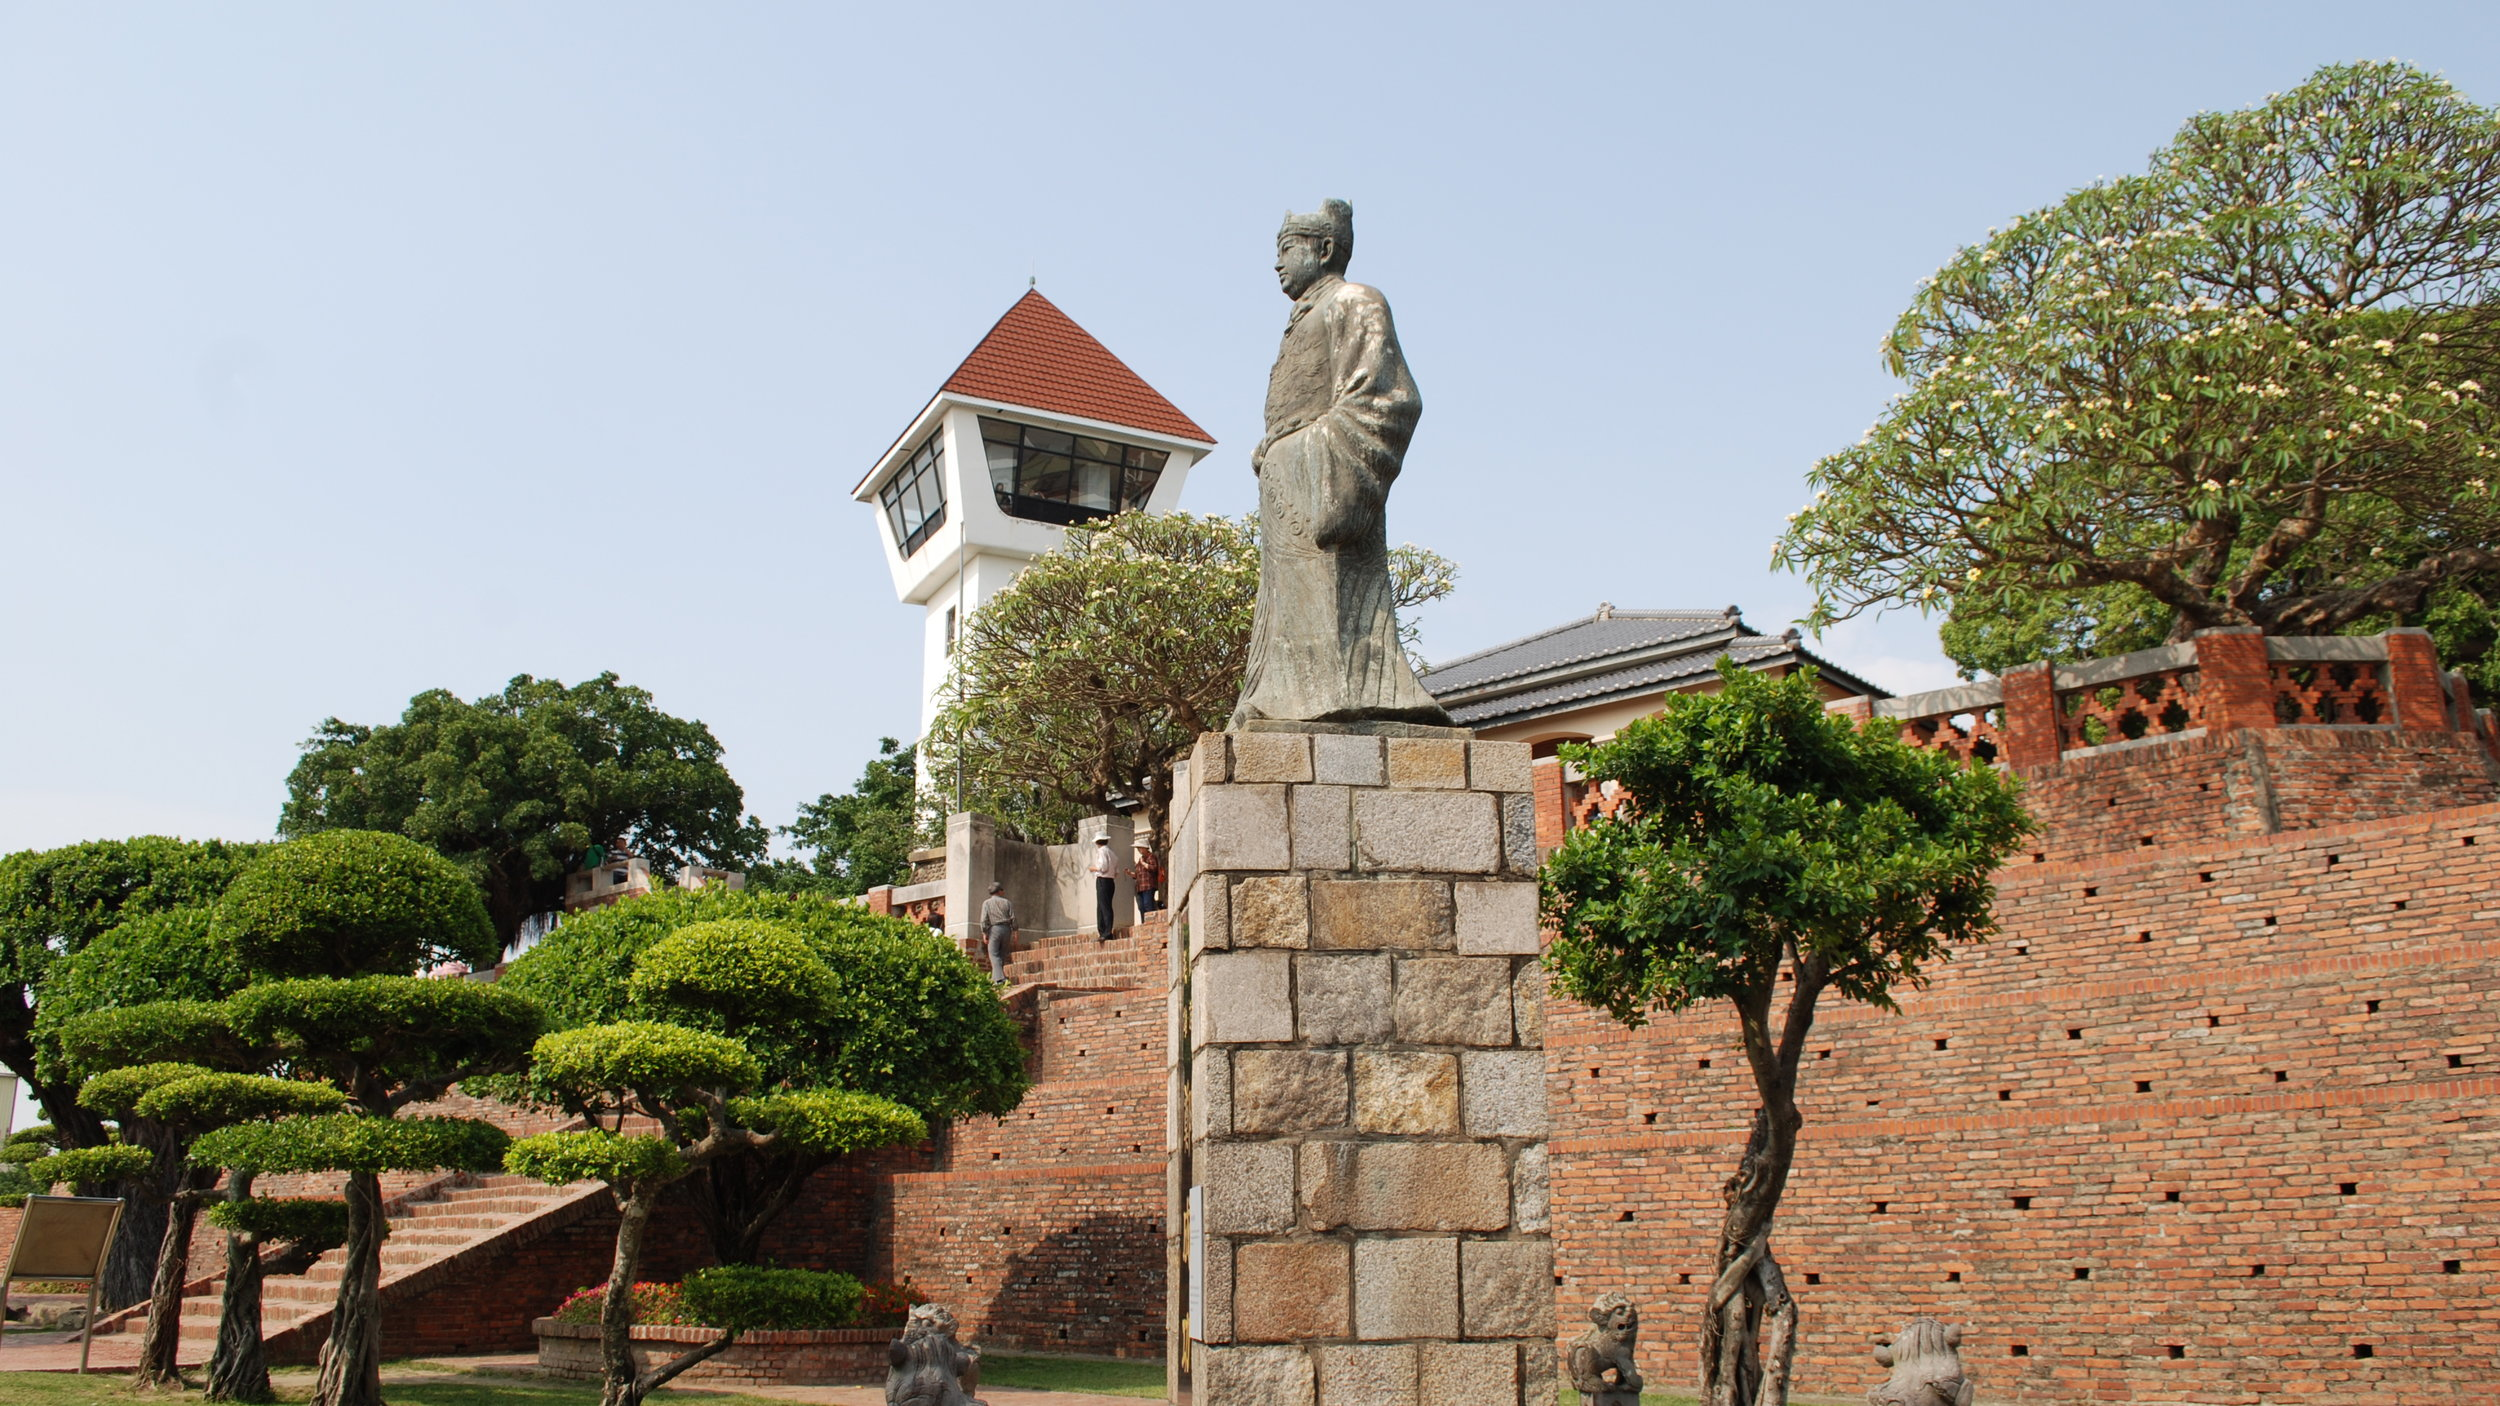 Fort Zelandia, Tainan, Taiwan